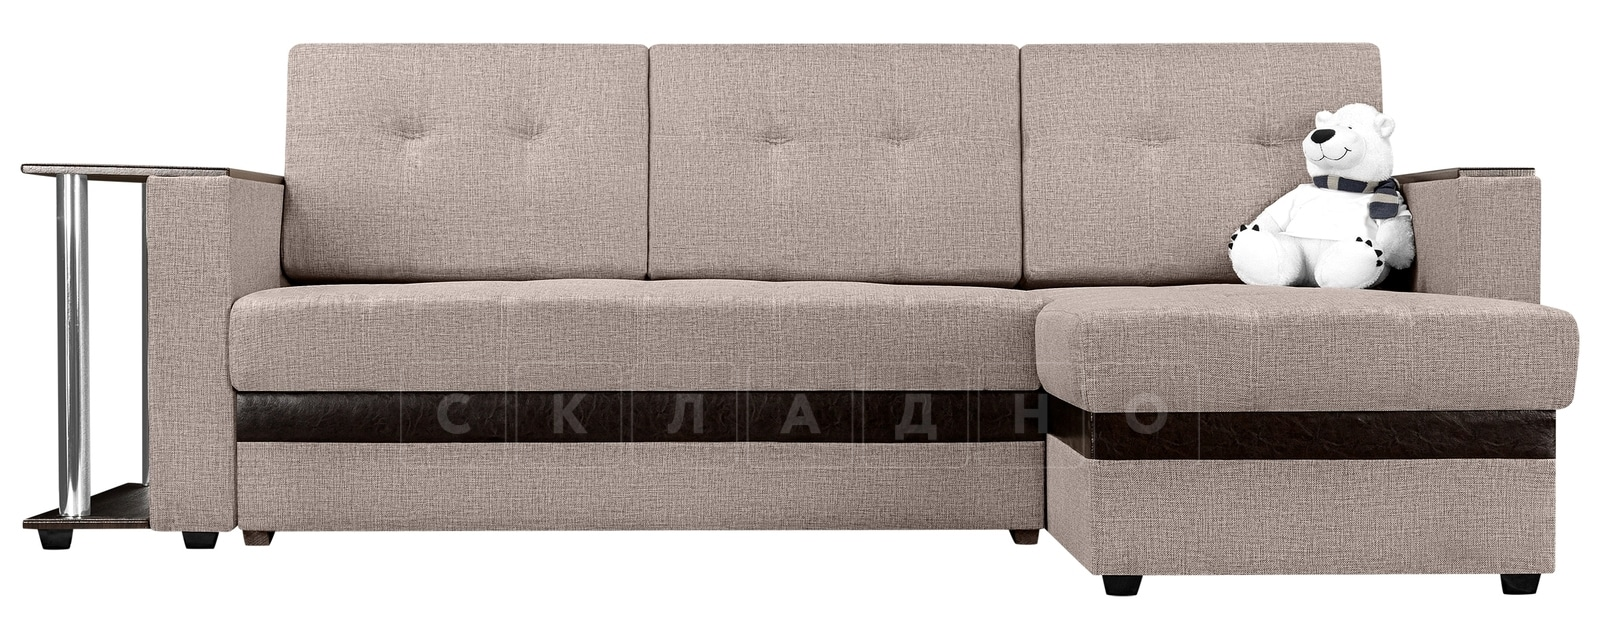 Угловой диван Атланта рогожка темно-бежевого цвета фото 2 | интернет-магазин Складно